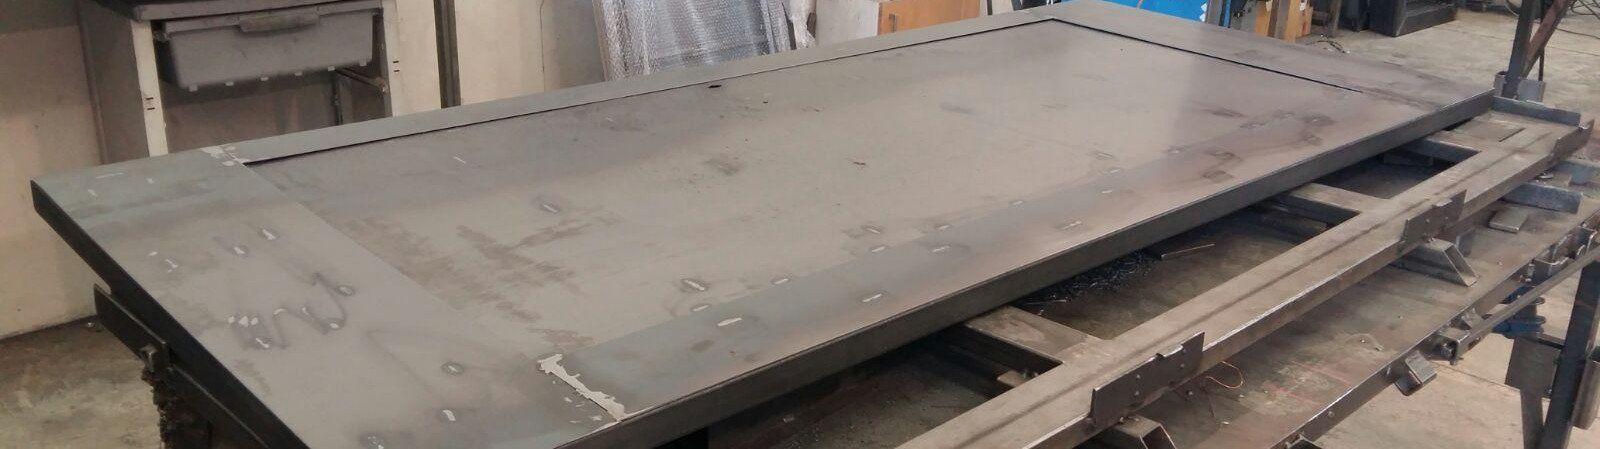 fabricacion puertas antiokupa hori - Presupuesto Puerta Anti okupas Precio